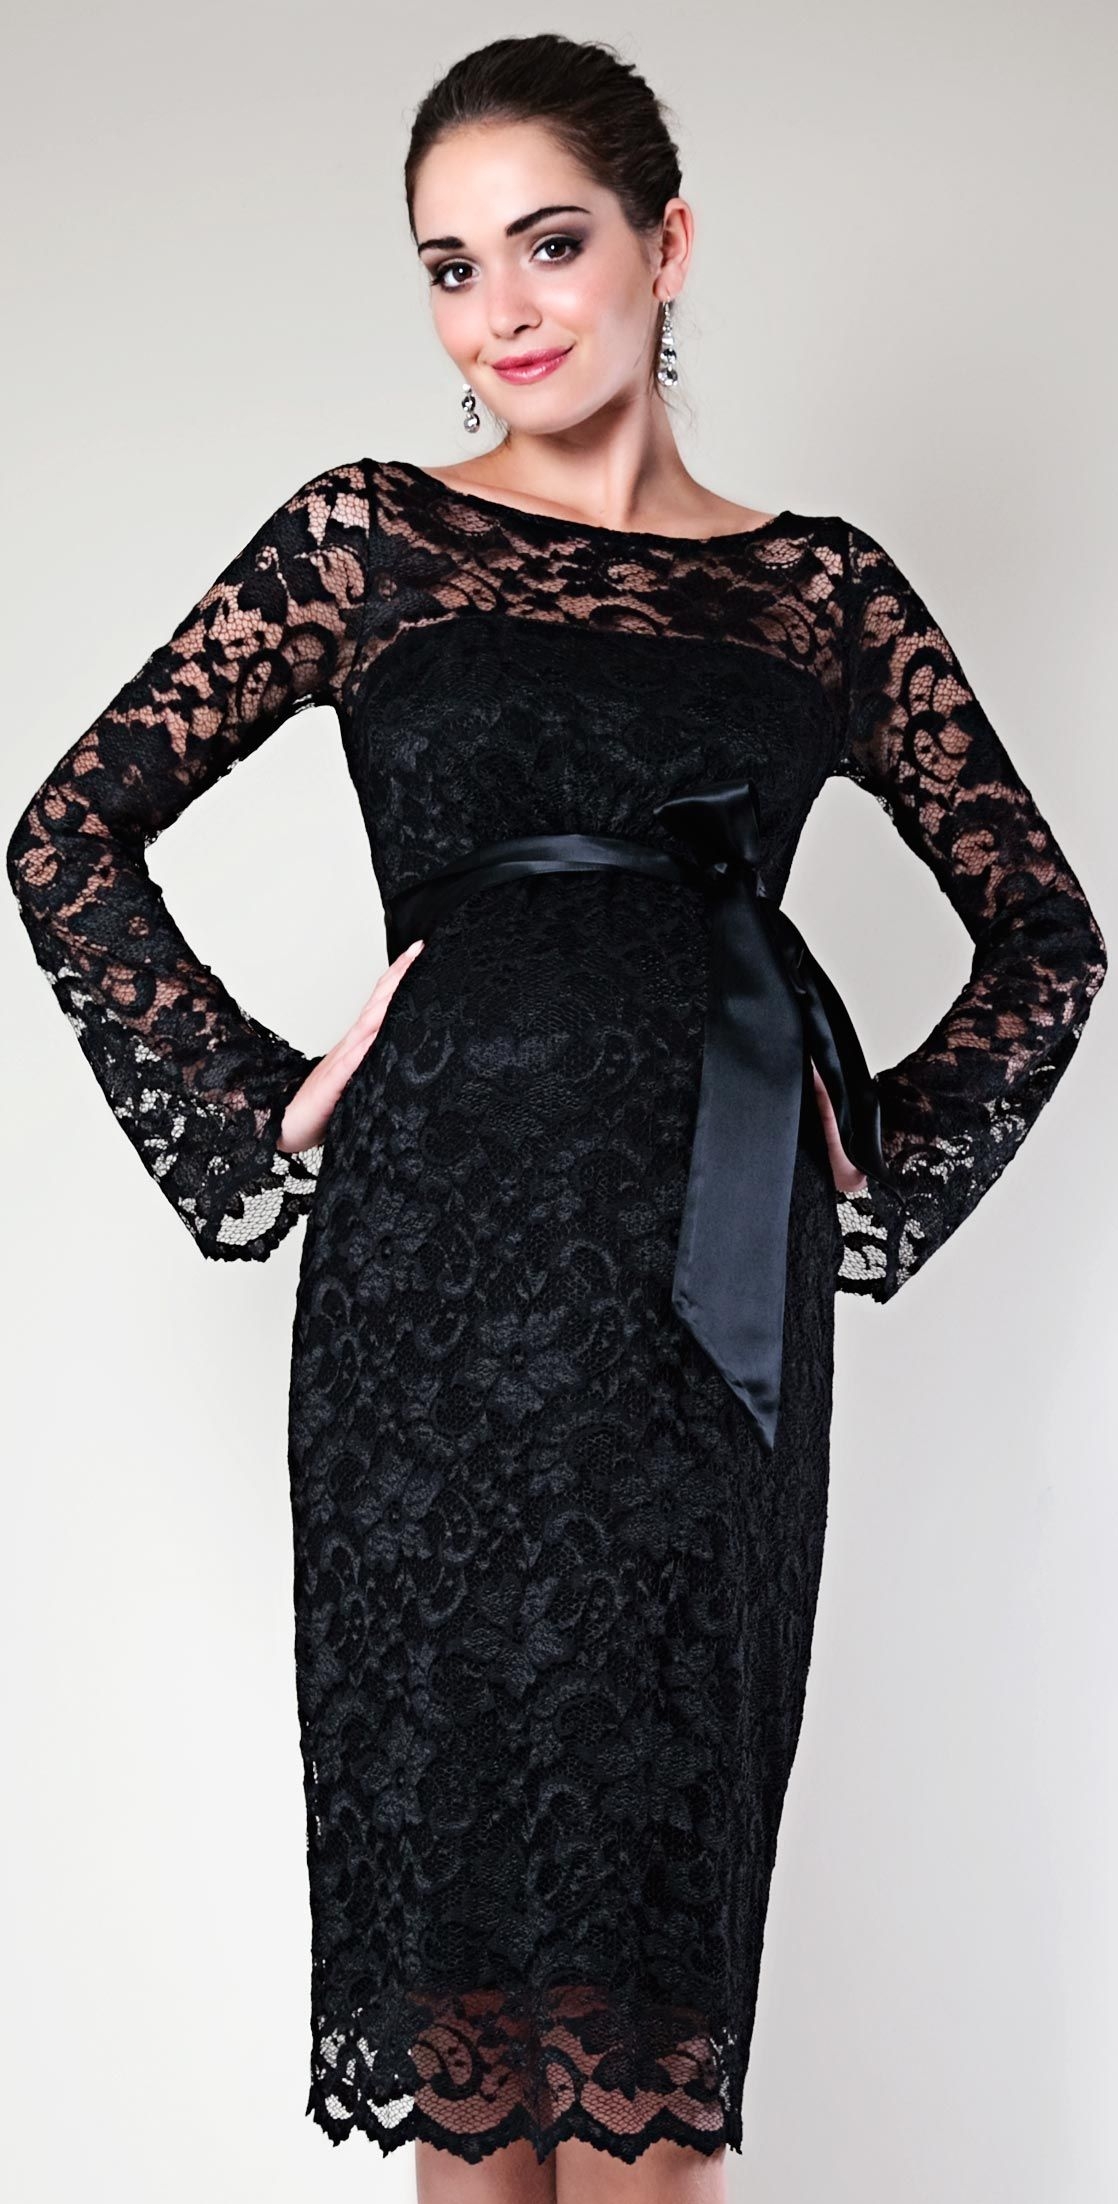 Chloe lace dress short tiffany rose party clothes and maternity chloe lace dress short ombrellifo Gallery